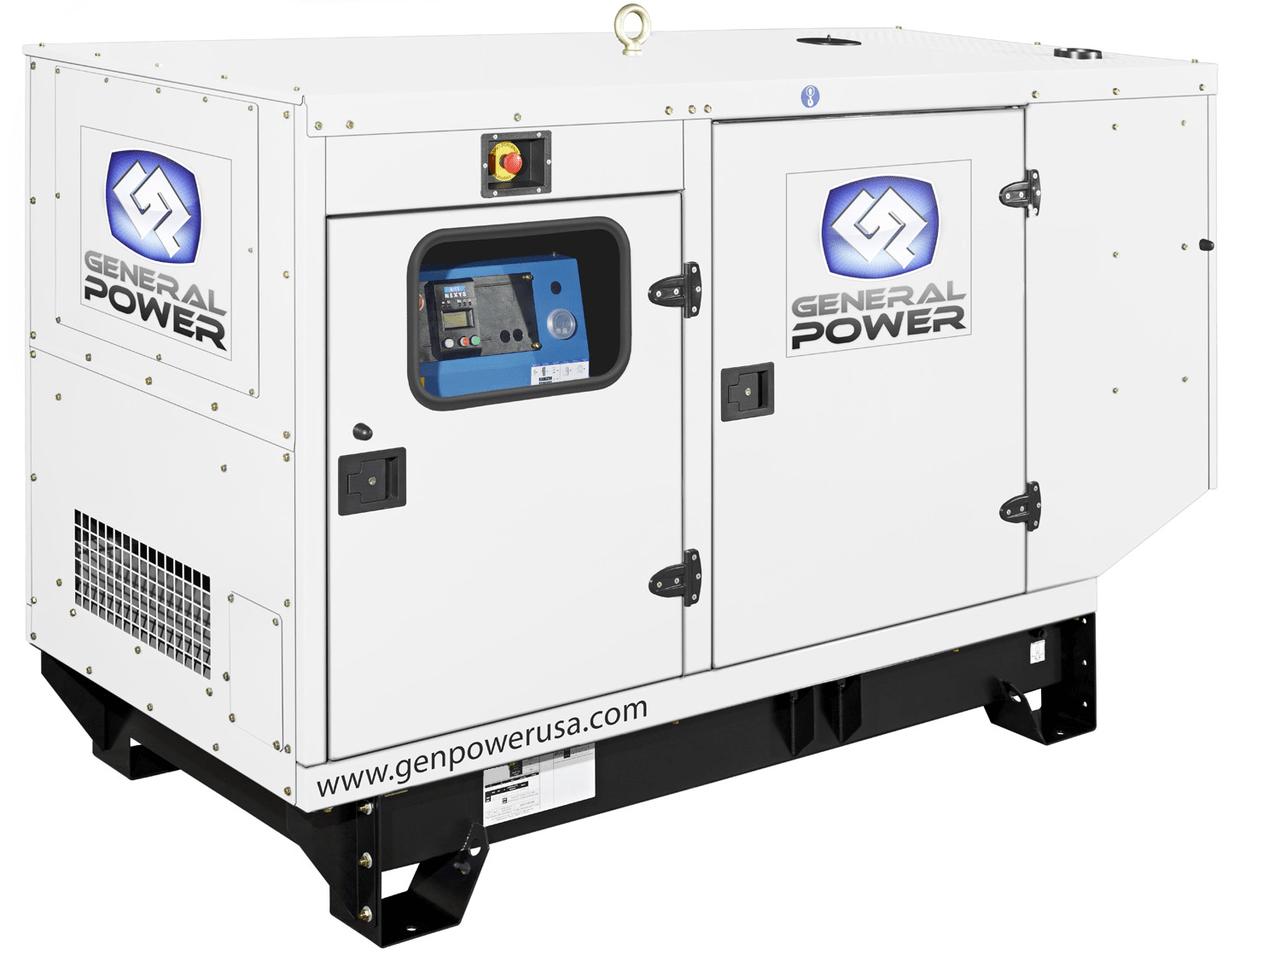 small resolution of 100 kw diesel generator john deere diesel generator cat 22 kw generator cat 350 kw generator wiring diagram